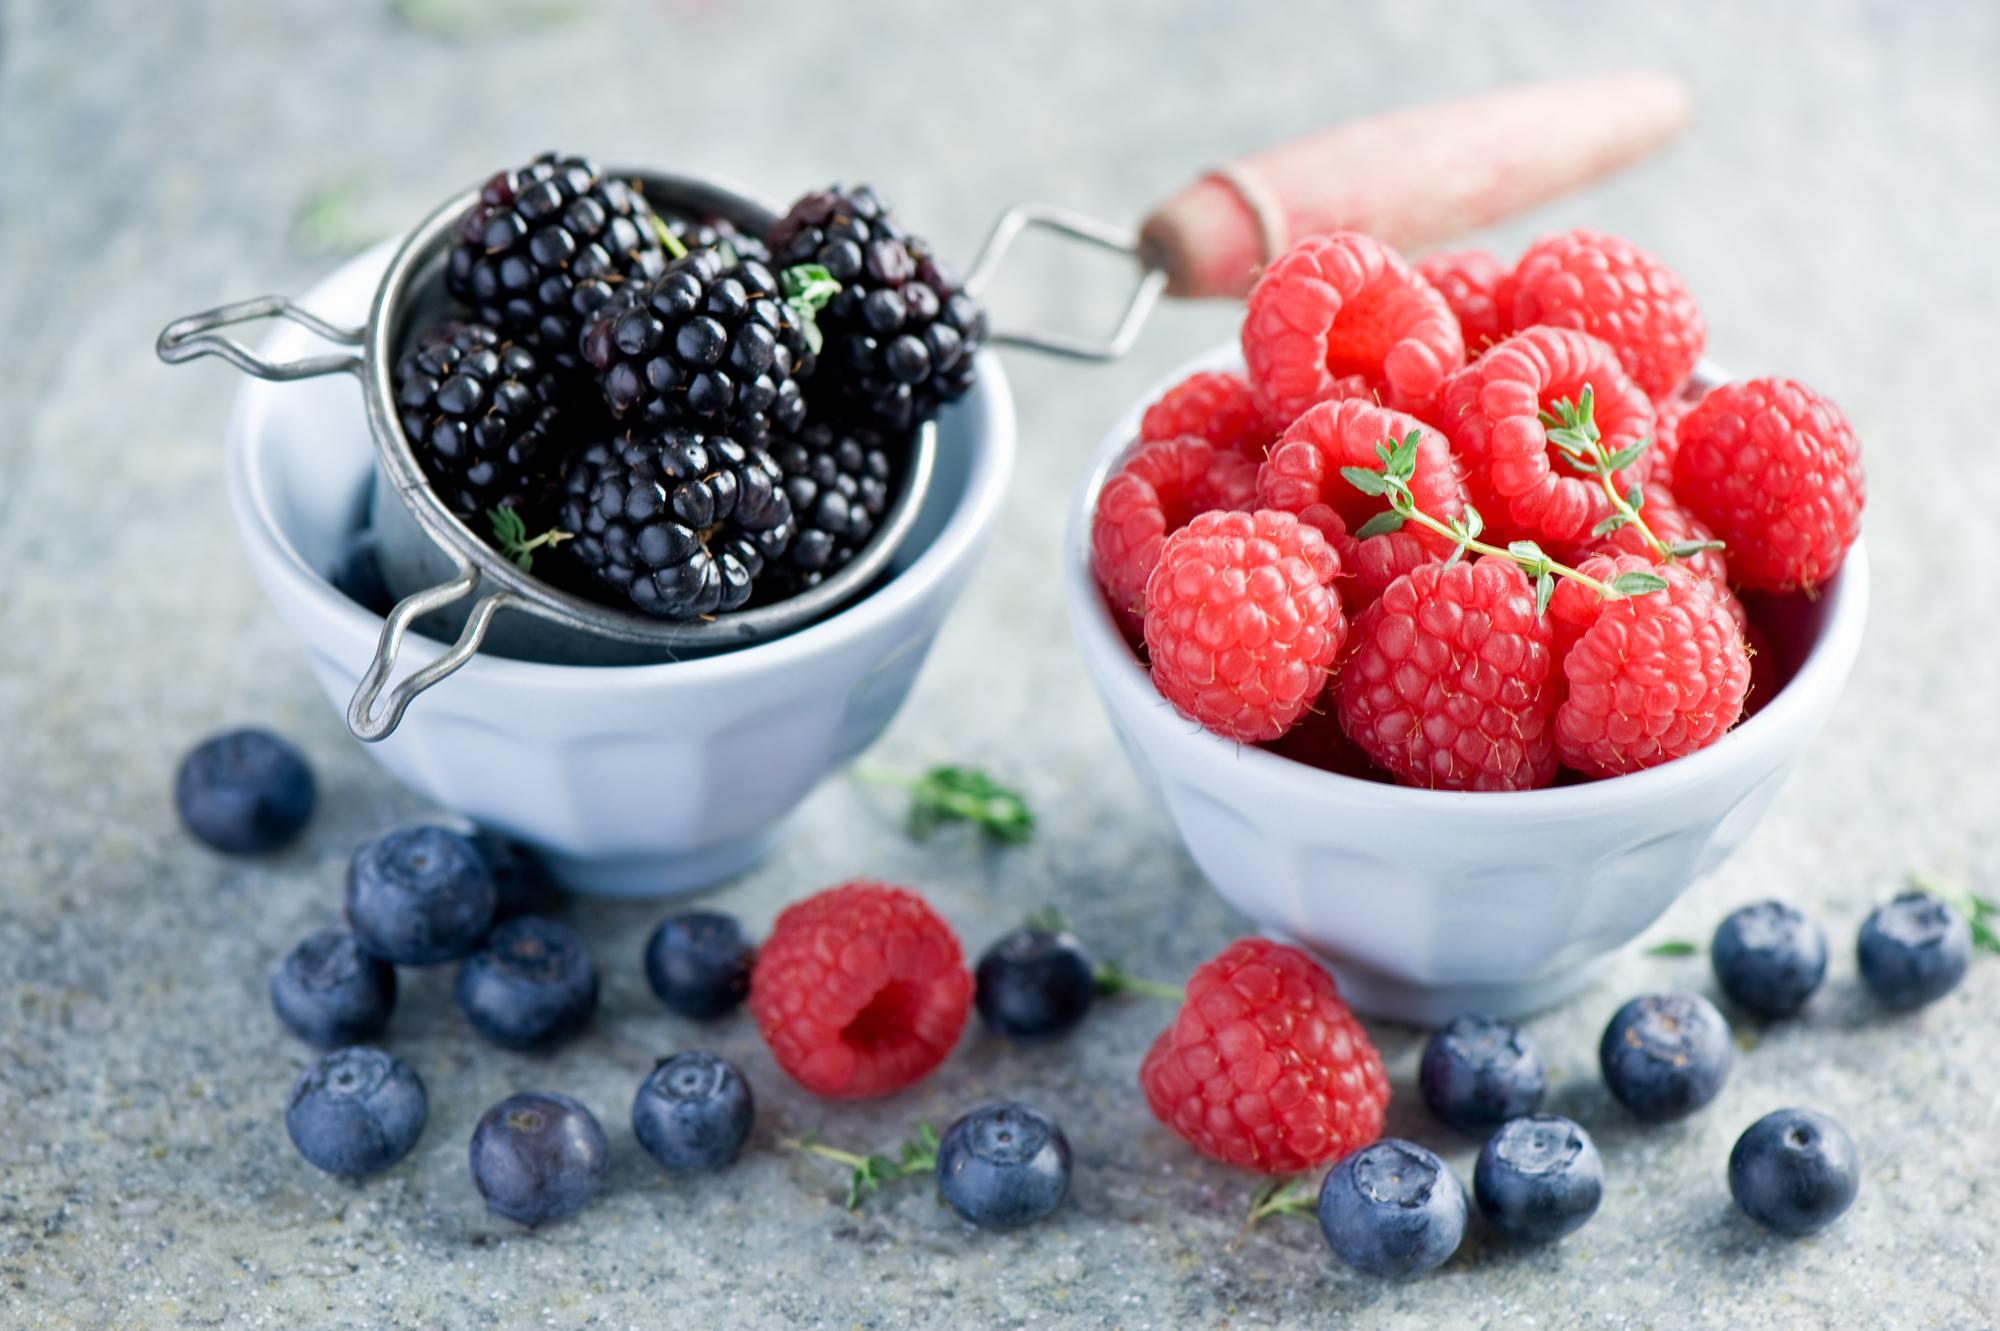 wallpaper fresh fruits berries - photo #10